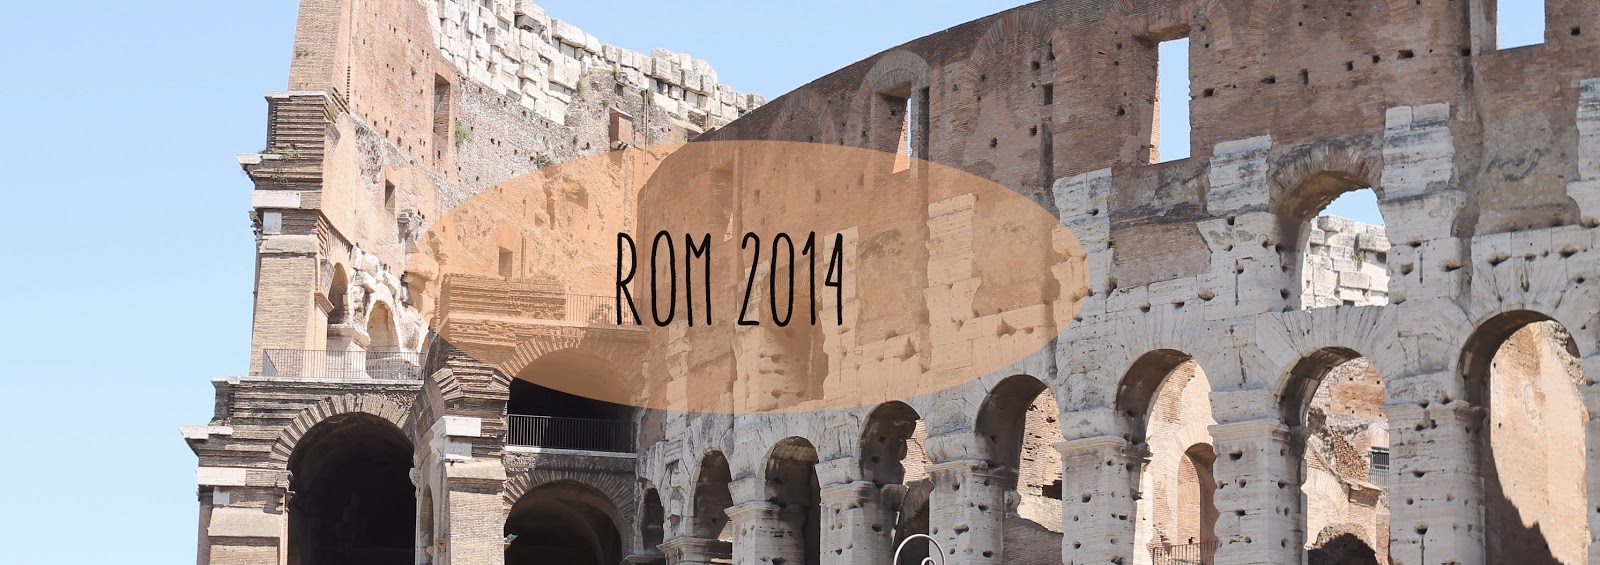 http://charlottenmarotten.blogspot.co.at/2014/09/rom-ein-minitravelguide.html